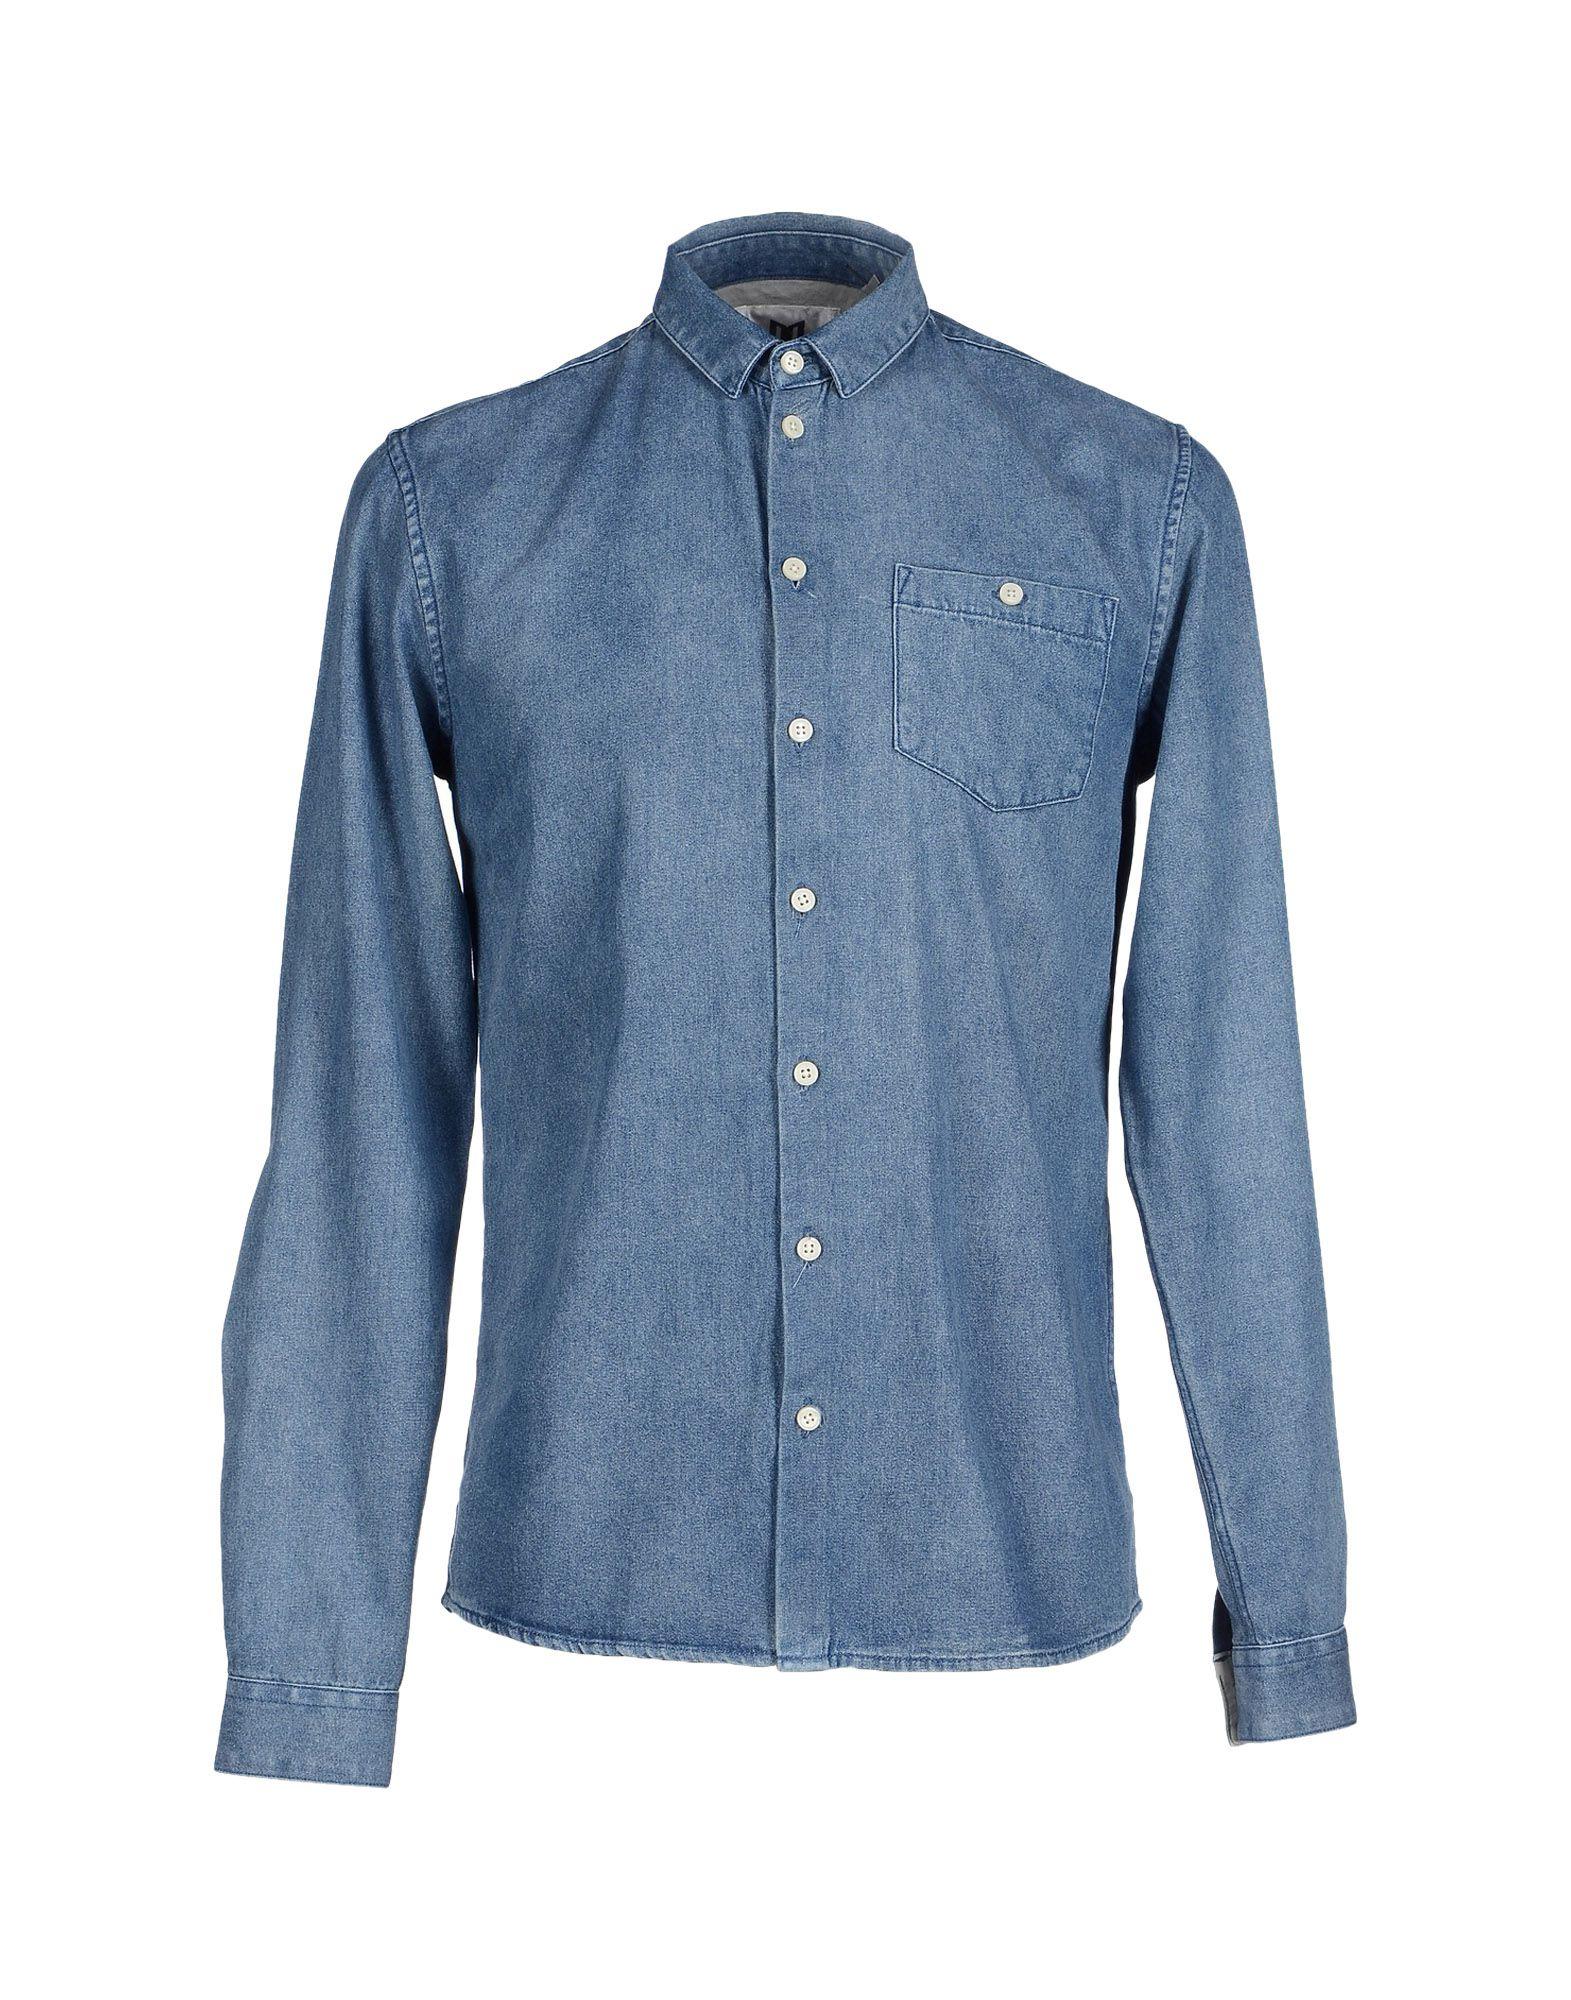 MINIMUM Джинсовая рубашка minimum джинсовая рубашка